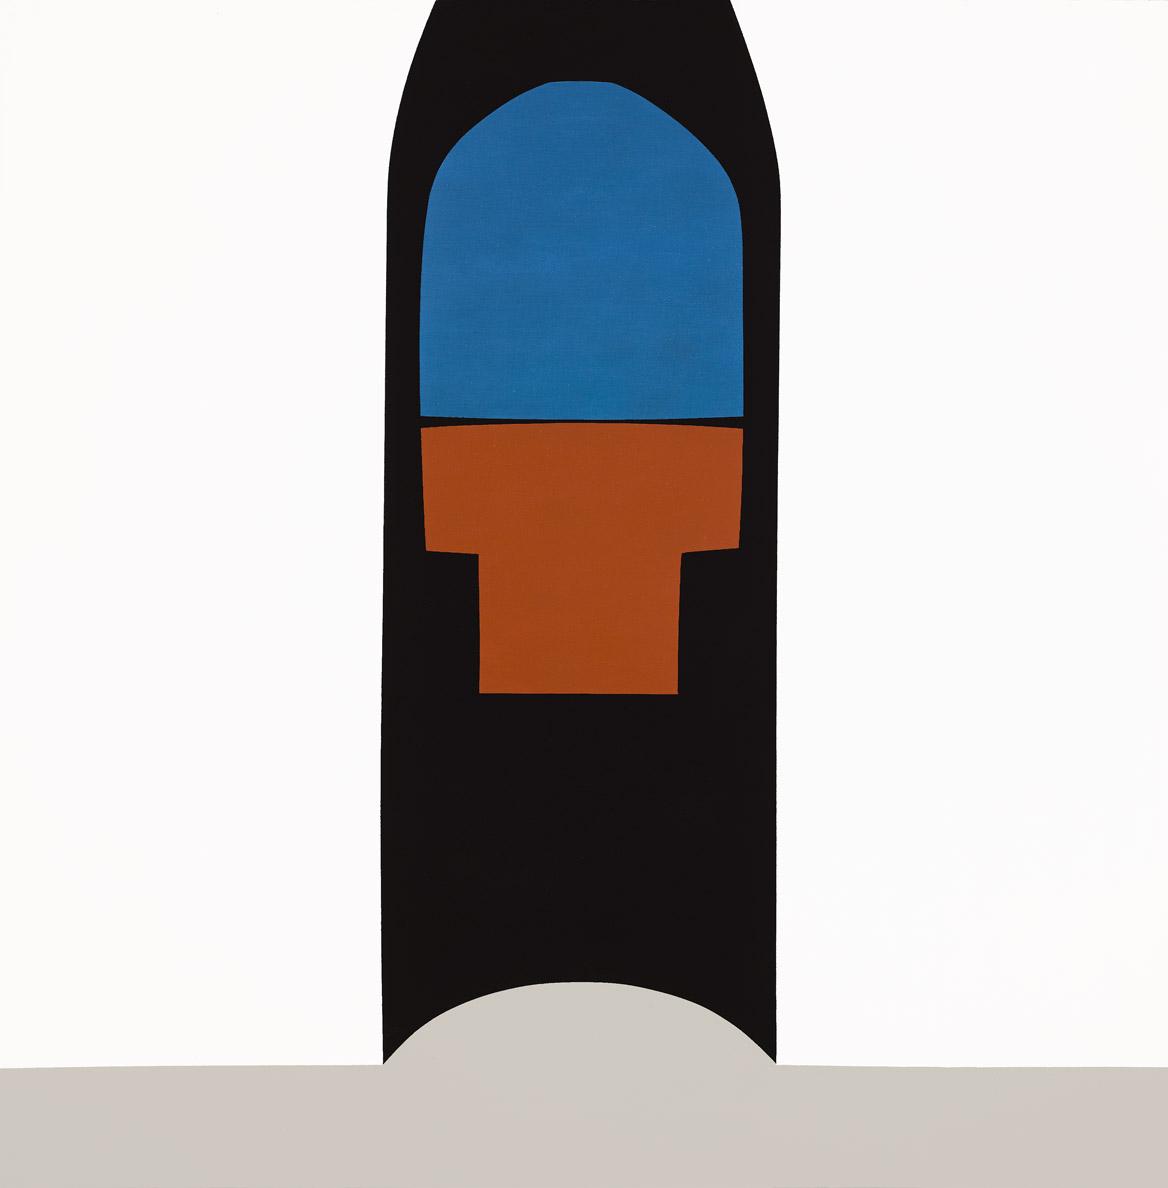 Kurigalzu's Arch , 1964  acrylic on canvas 60 x 60 inches; 152.4 x 152.4 centimeters